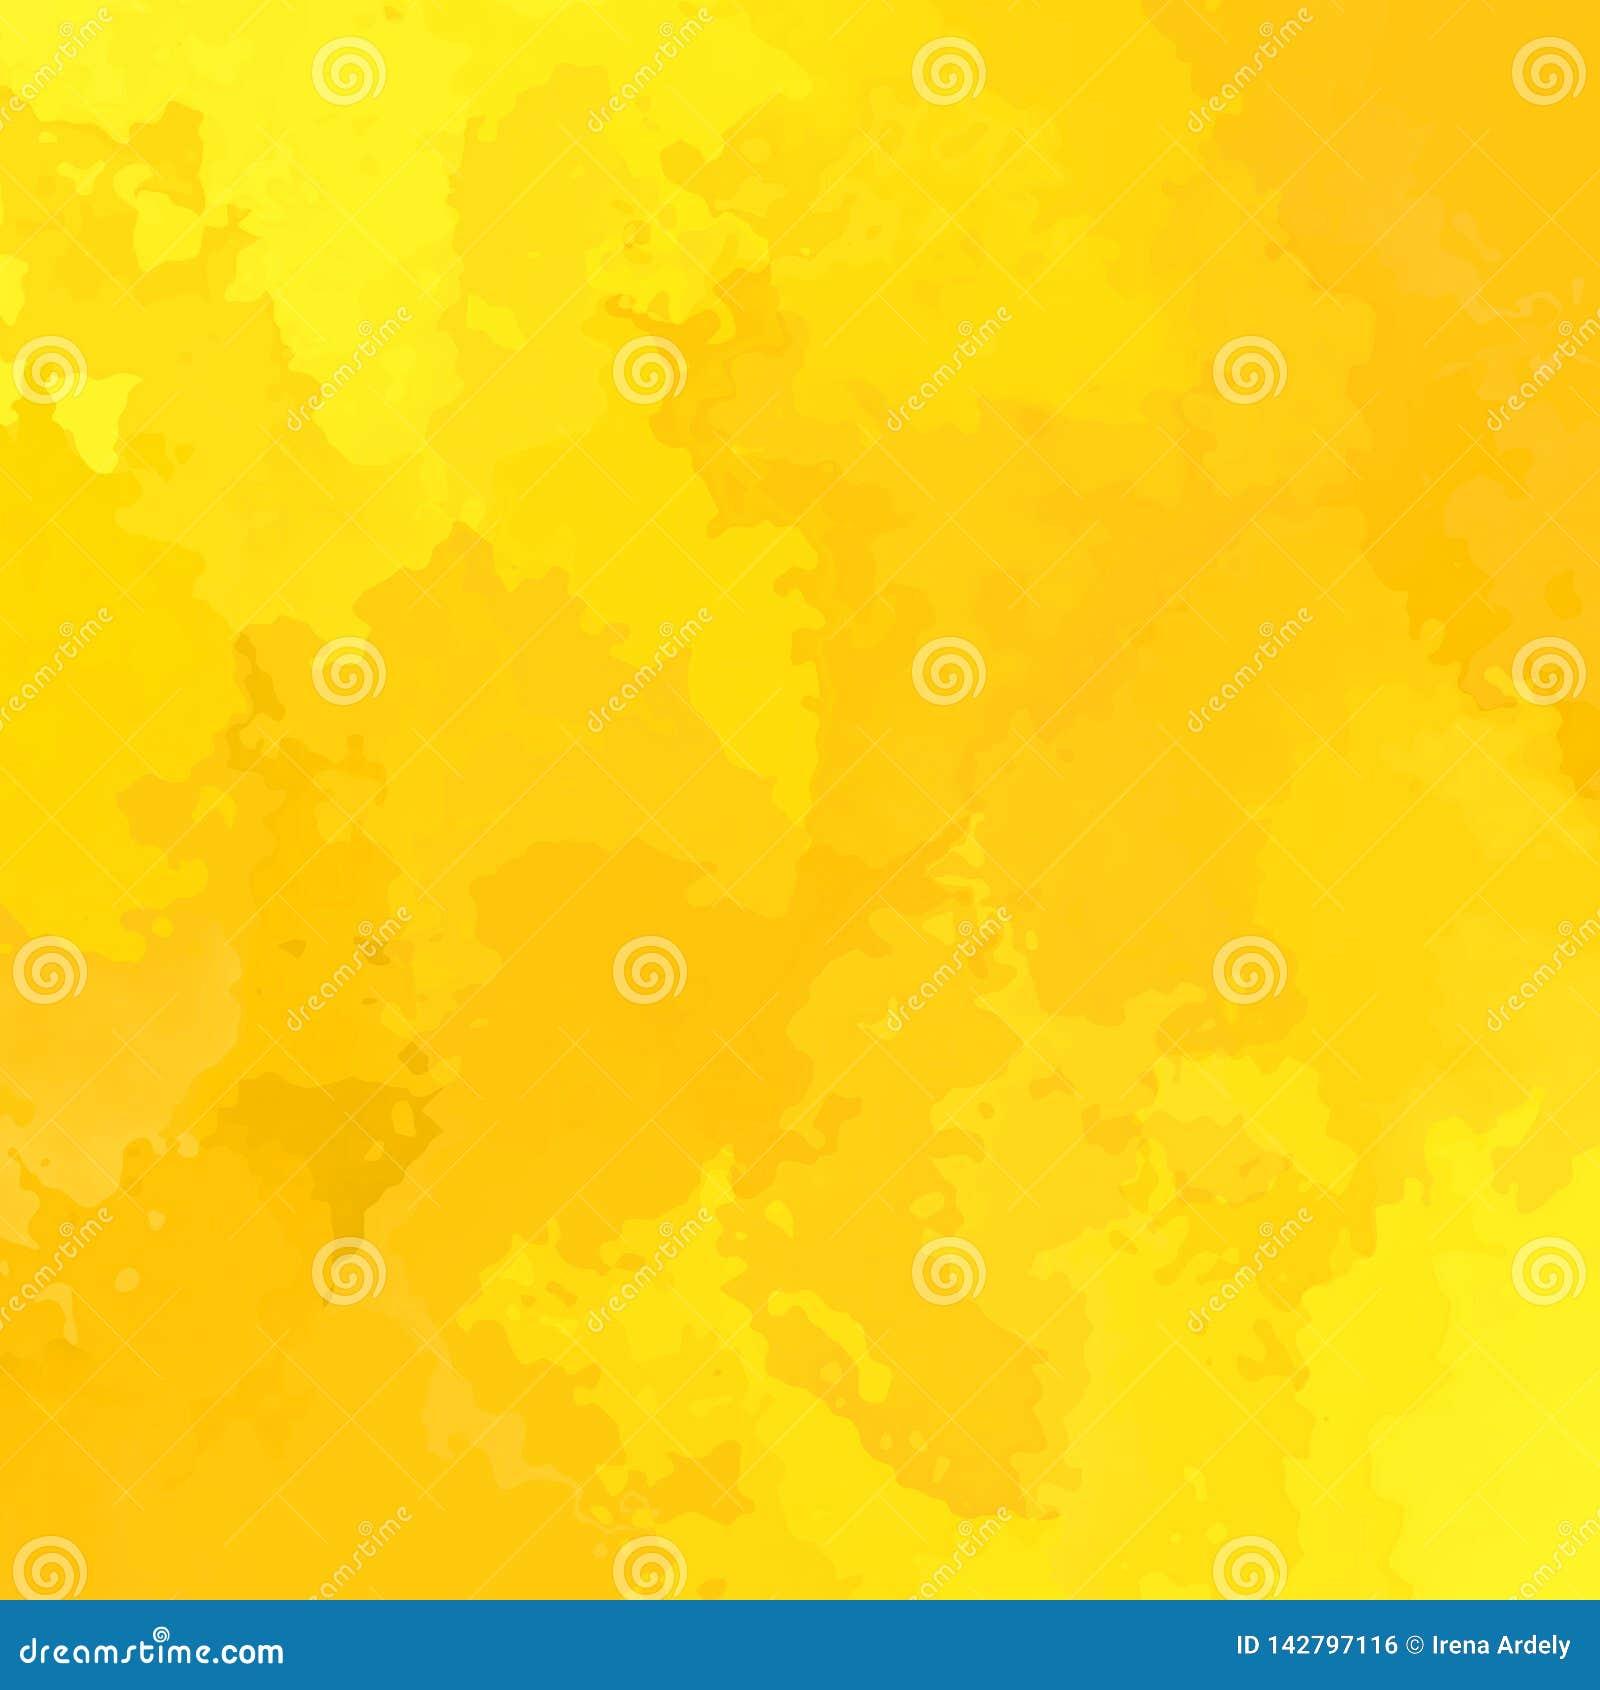 Abstrakt plamiący kwadratowego tła pogodny żółty kolor akwareli splotch skutek - nowożytna obraz sztuka -